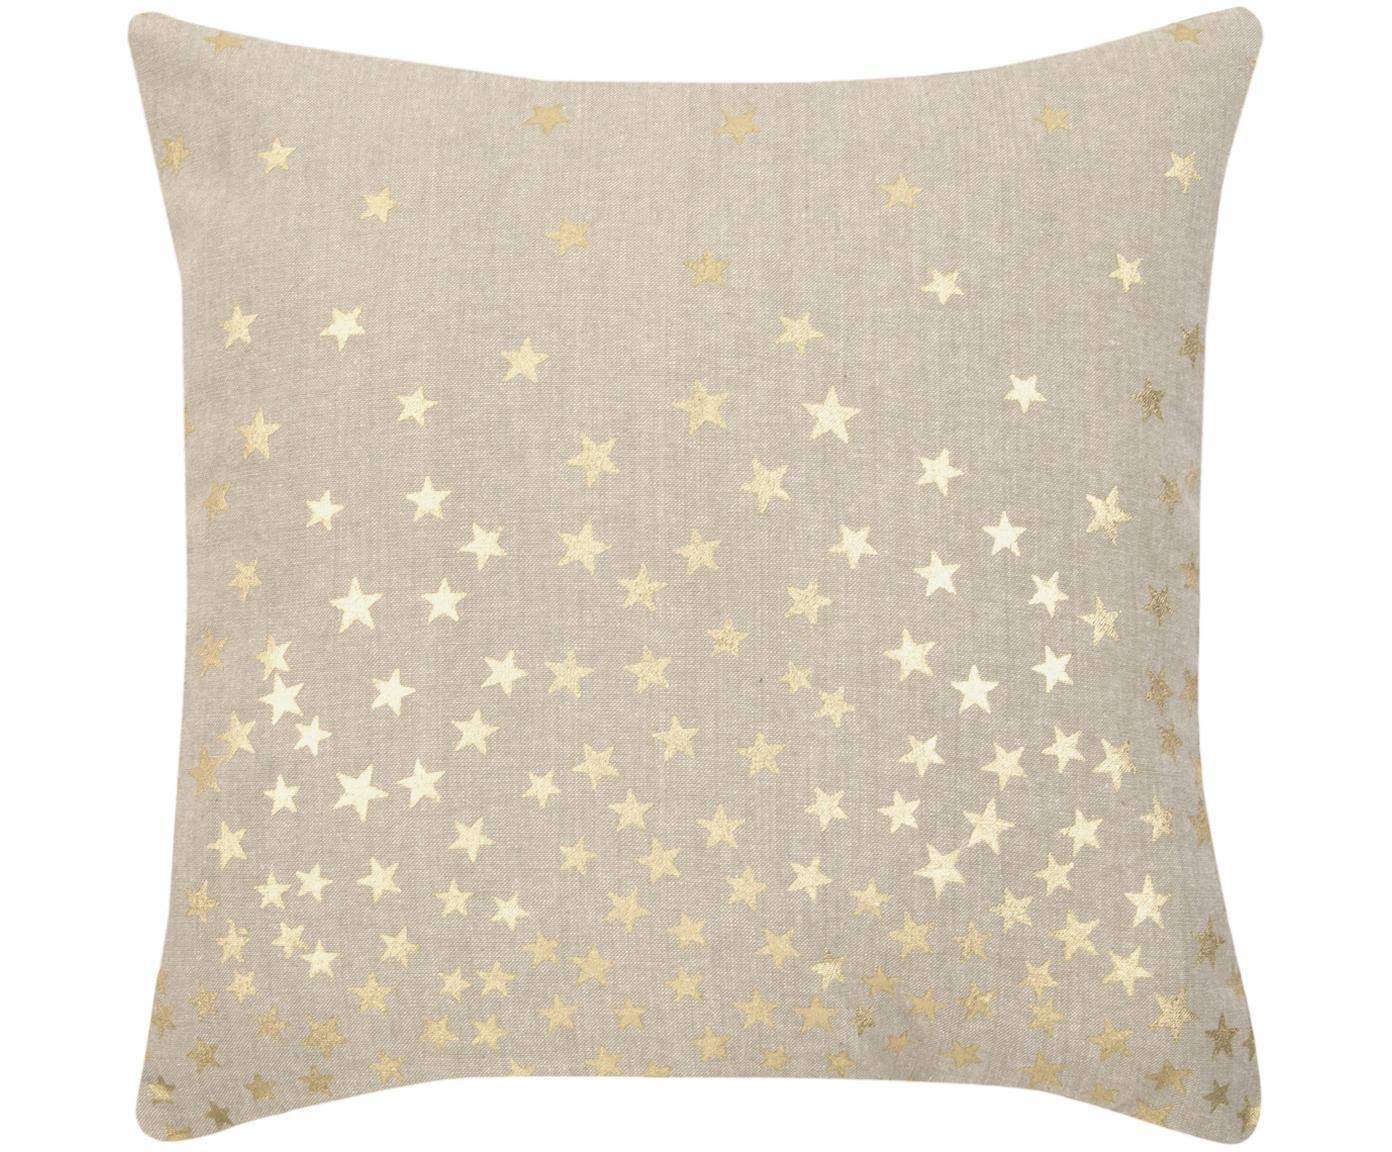 Federa arredo Goldstar, 100% cotone, Beige, dorato, Larg. 45 x Lung. 45 cm